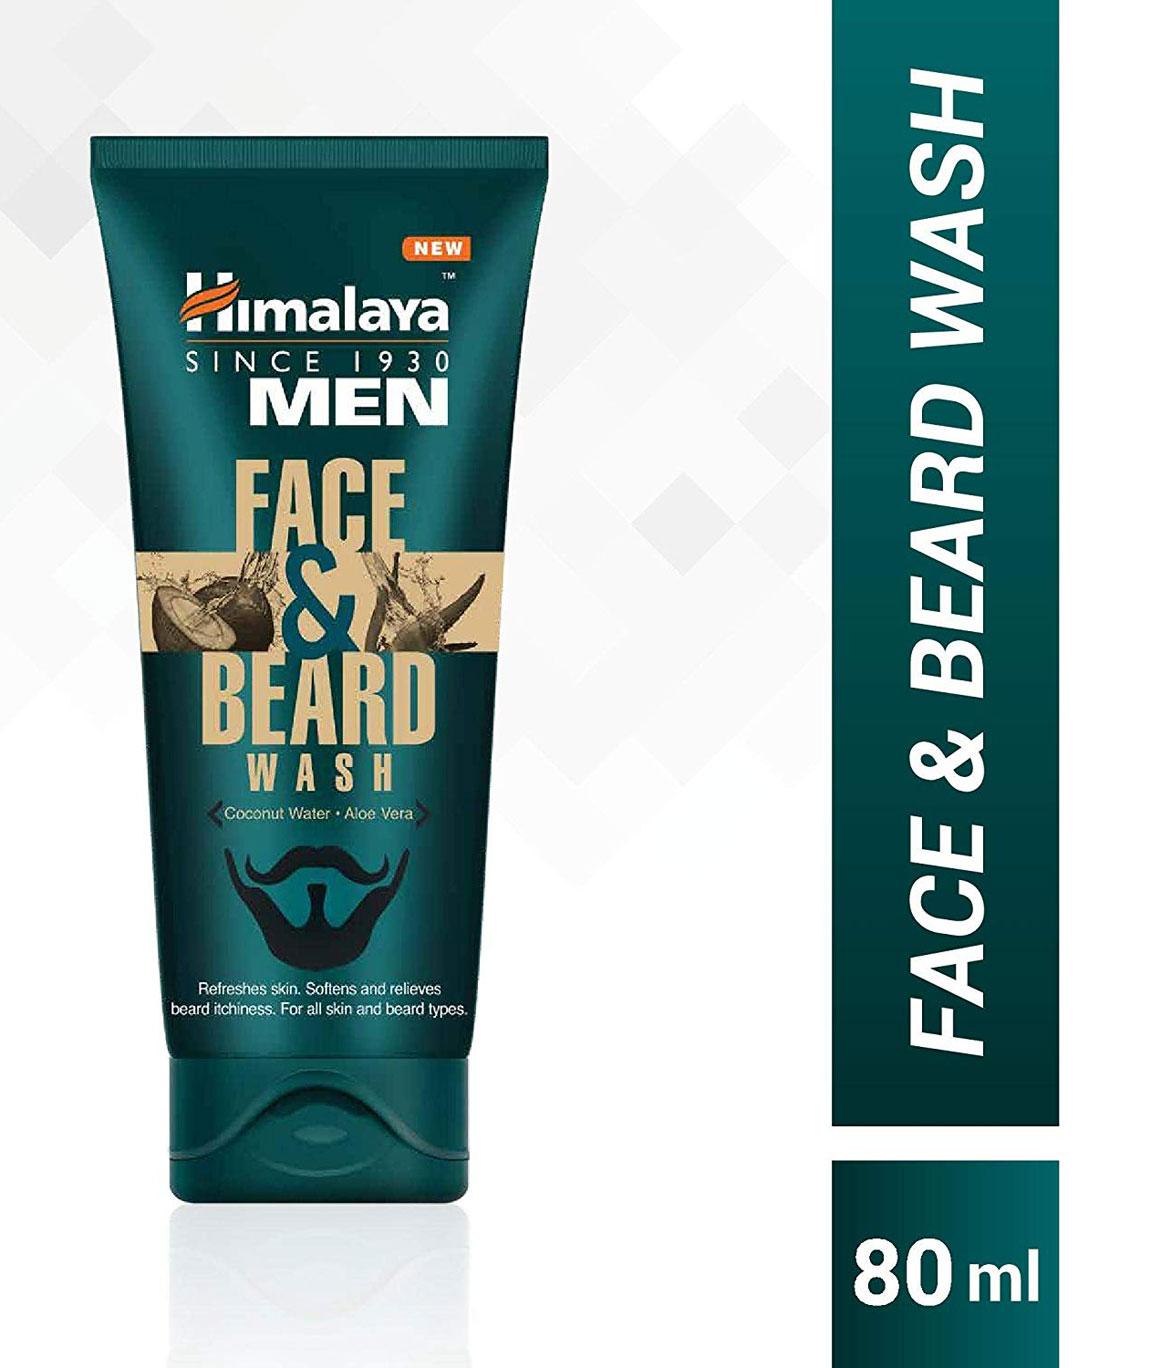 Himalaya Men Face And Beard Wash 80ml